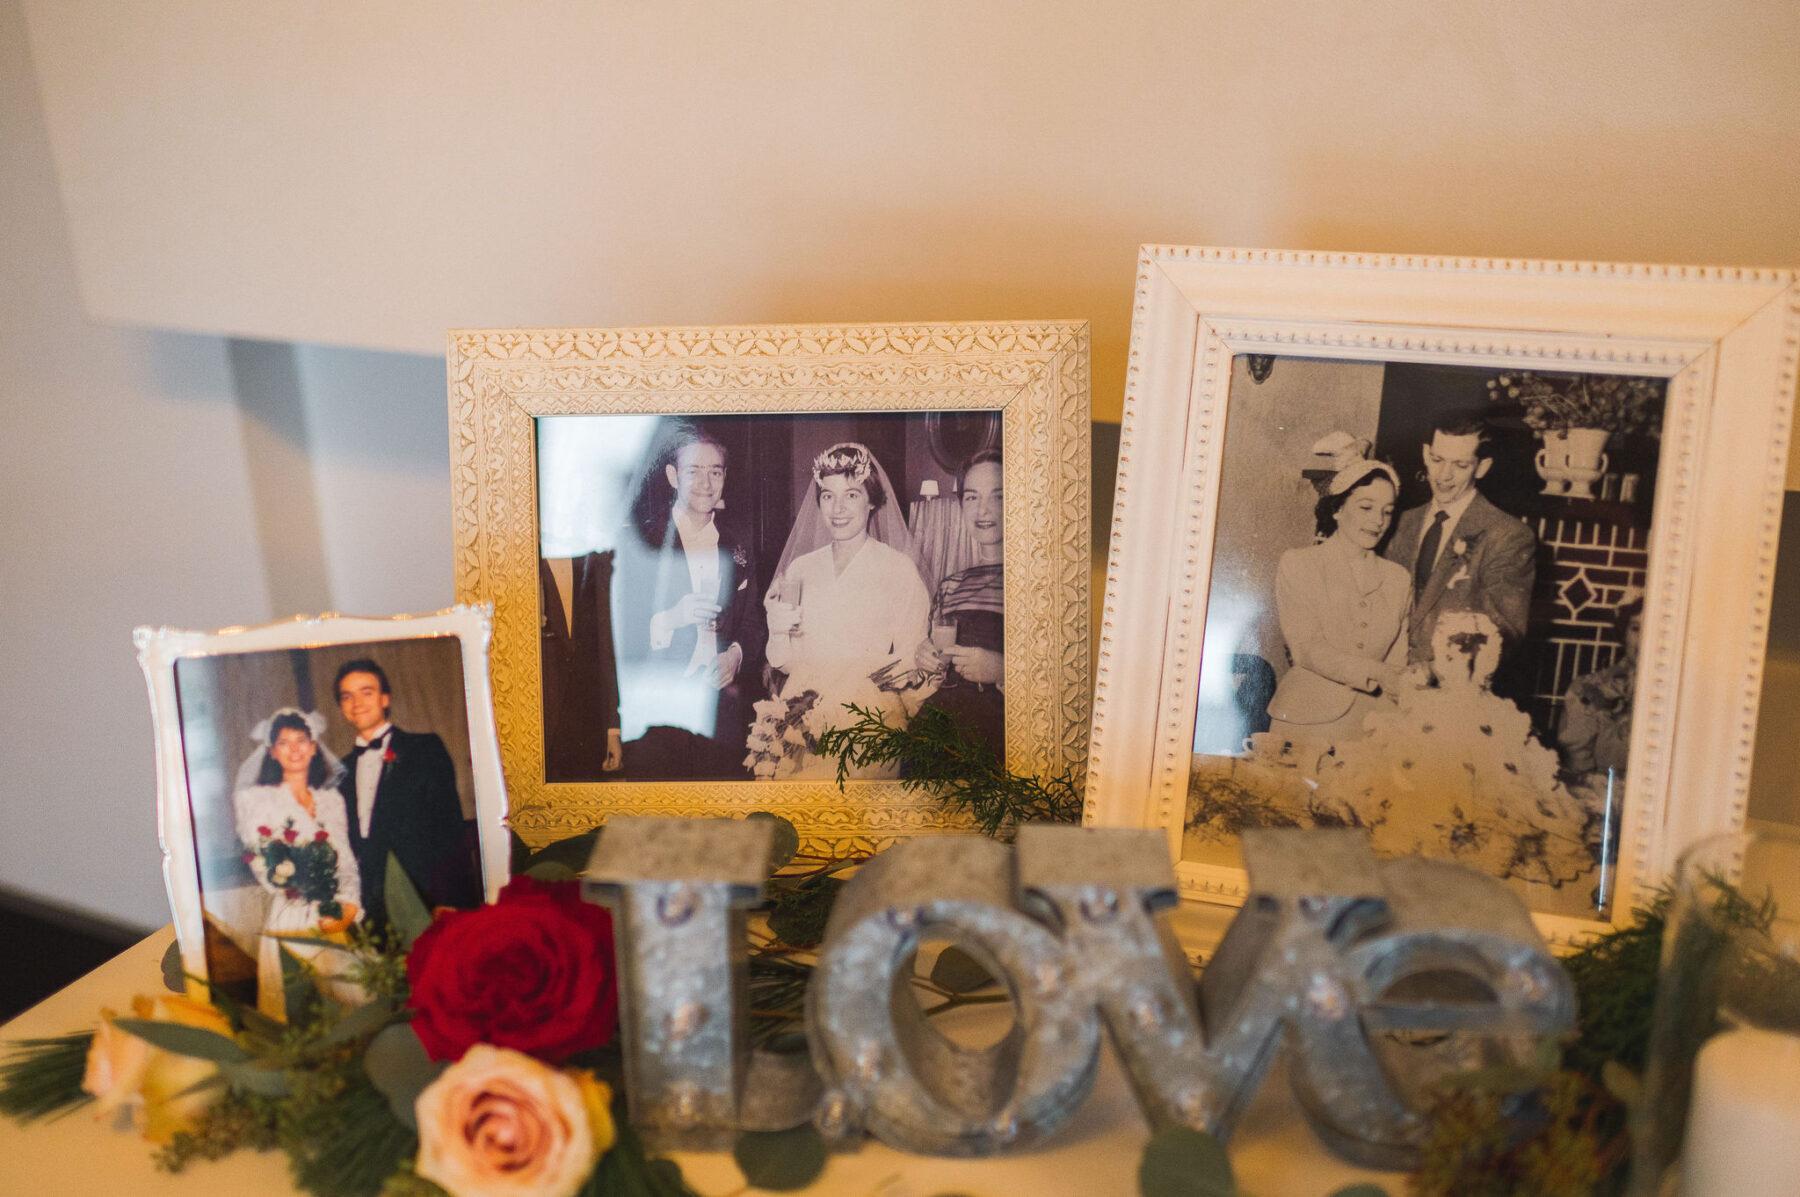 Generational wedding photos on display: Classic Winter Wedding by Details Nashville